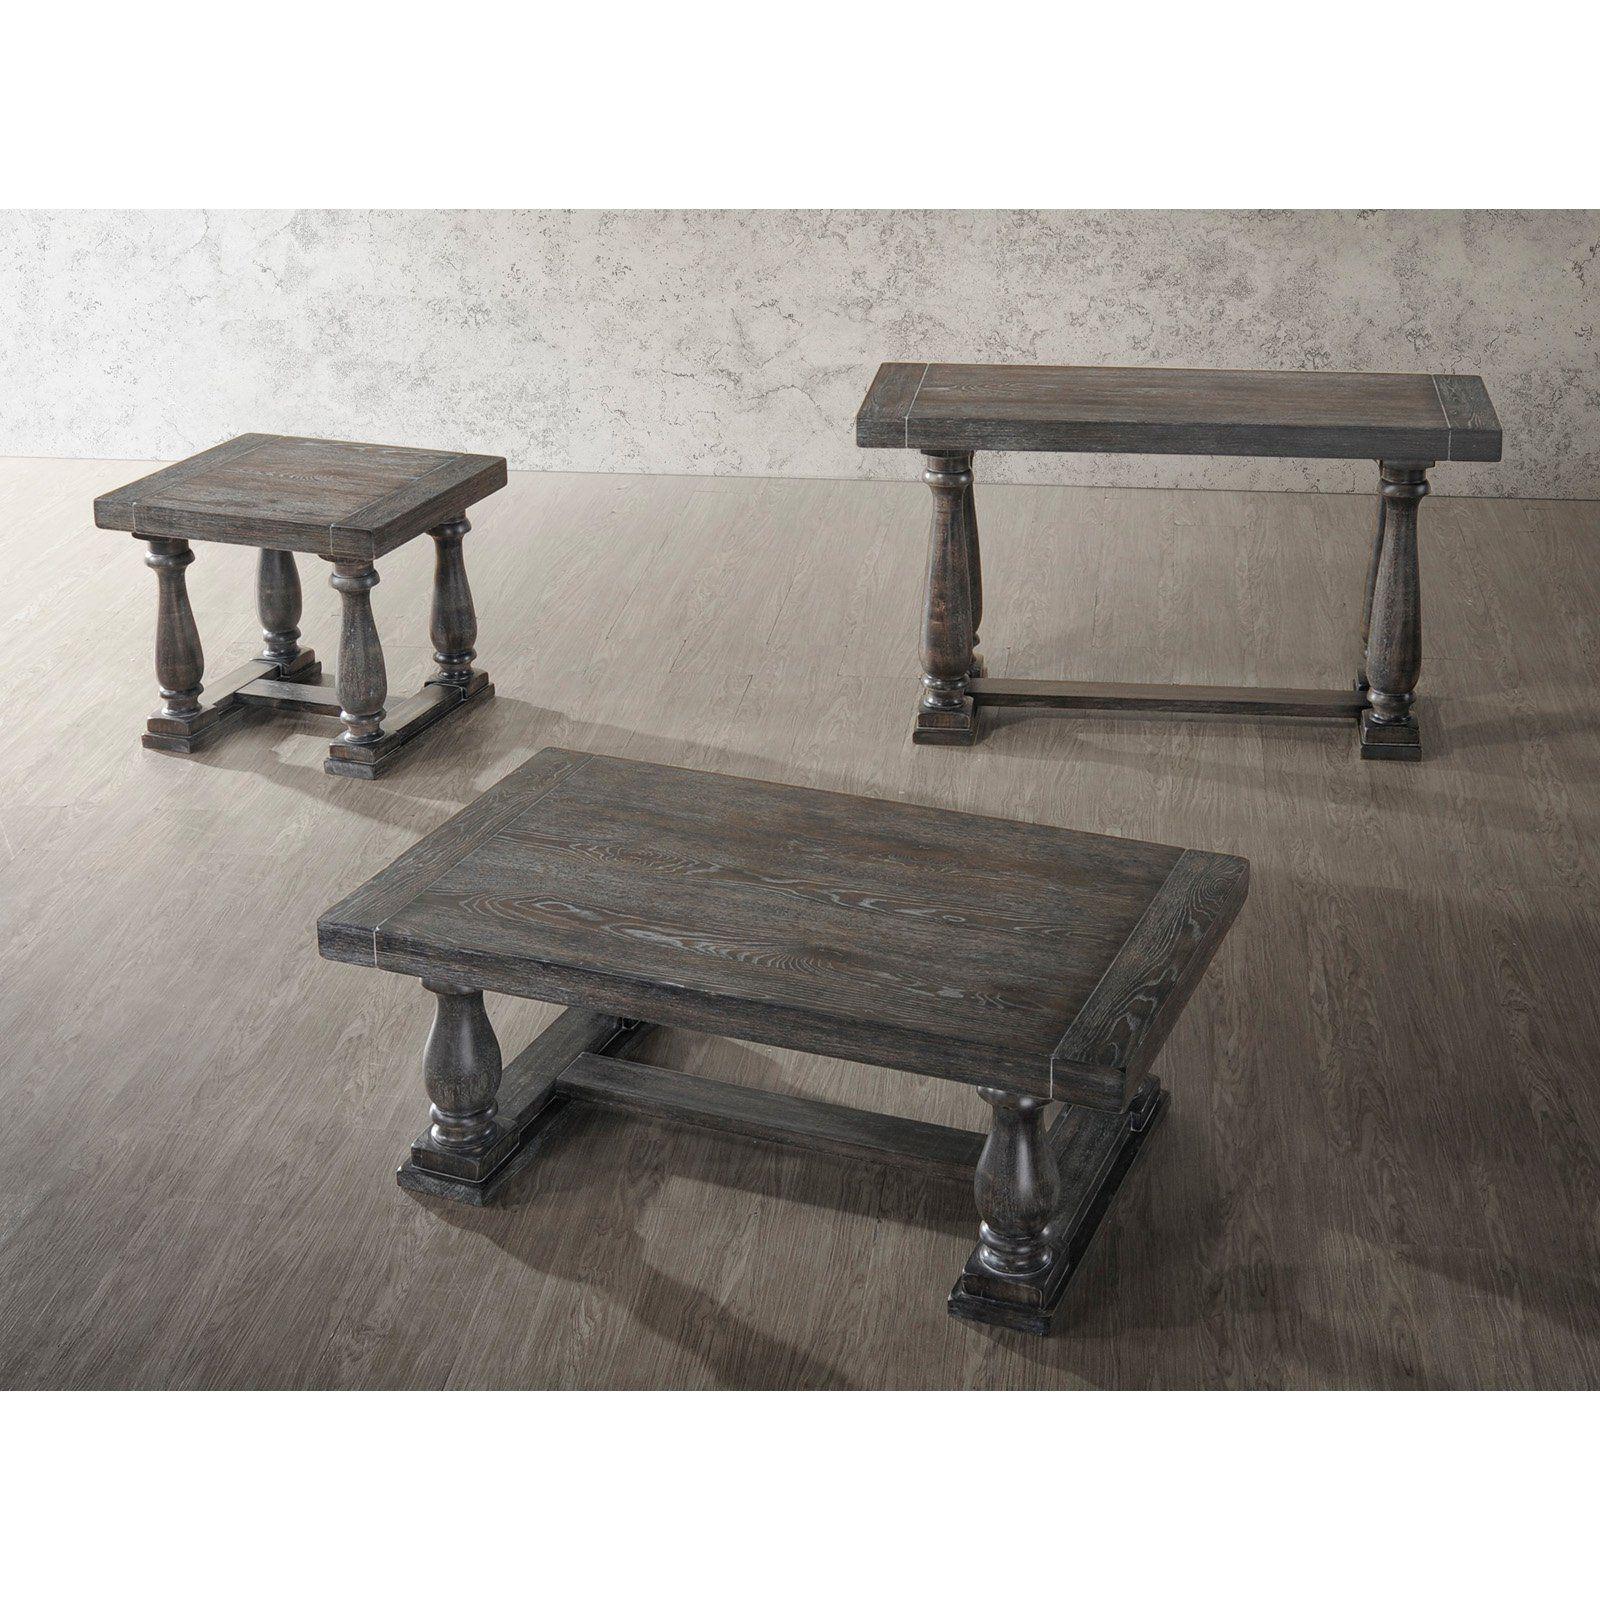 Best Master Furniture Katrina 3 Piece Coffee Table Set In 2021 Coffee Table French Country Coffee Table Best Master Furniture [ 1600 x 1600 Pixel ]